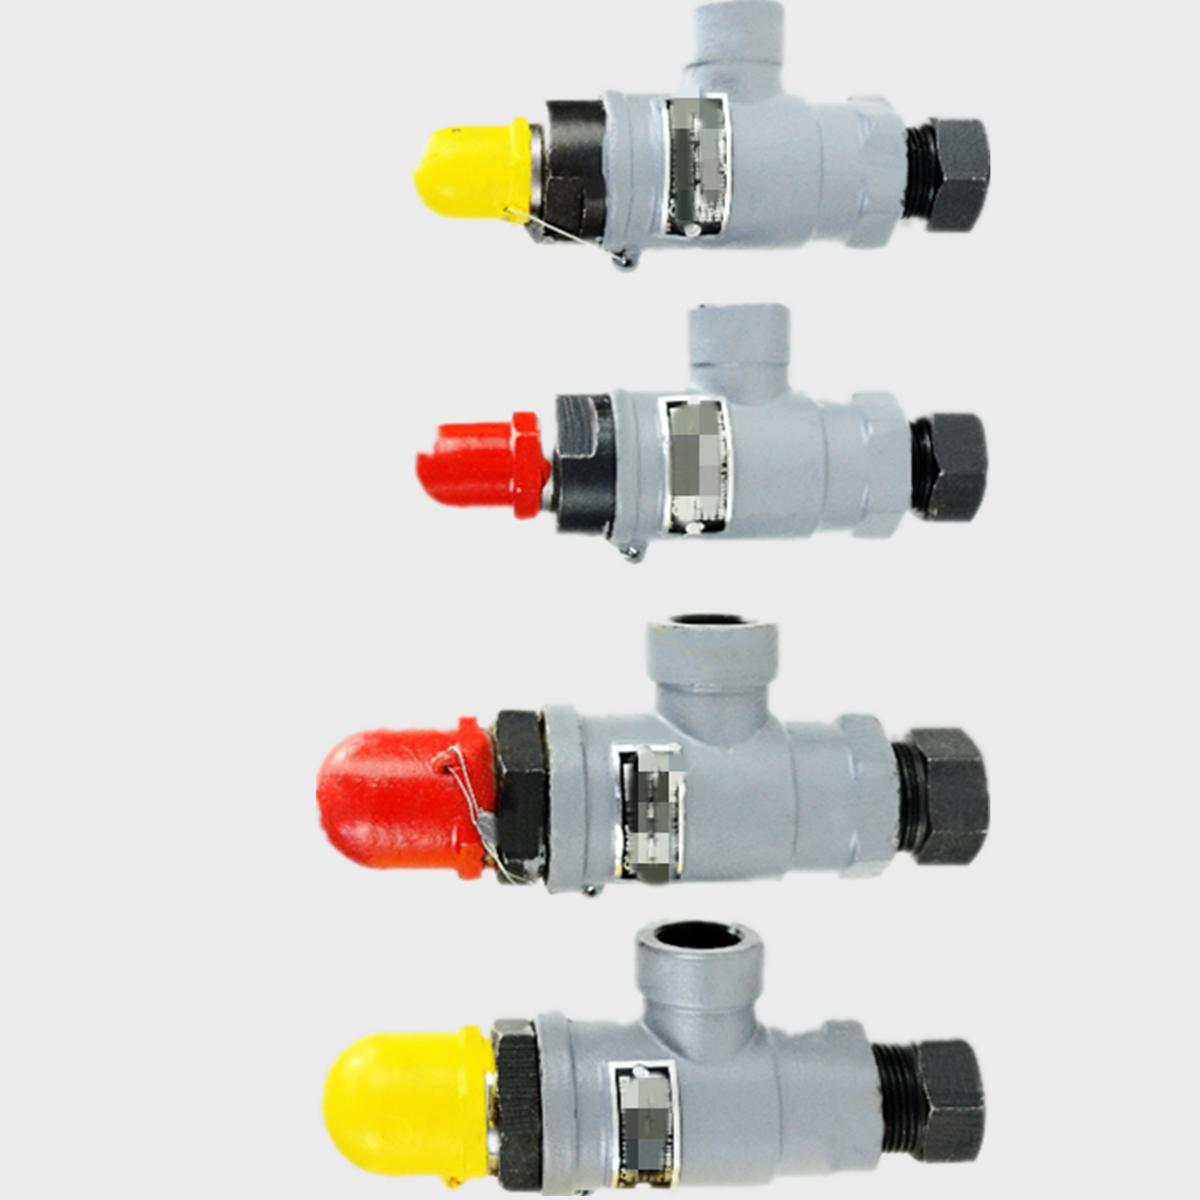 Ammonia fluoride refrigeration micro start safety valve Manufacturers, Ammonia fluoride refrigeration micro start safety valve Factory, Supply Ammonia fluoride refrigeration micro start safety valve